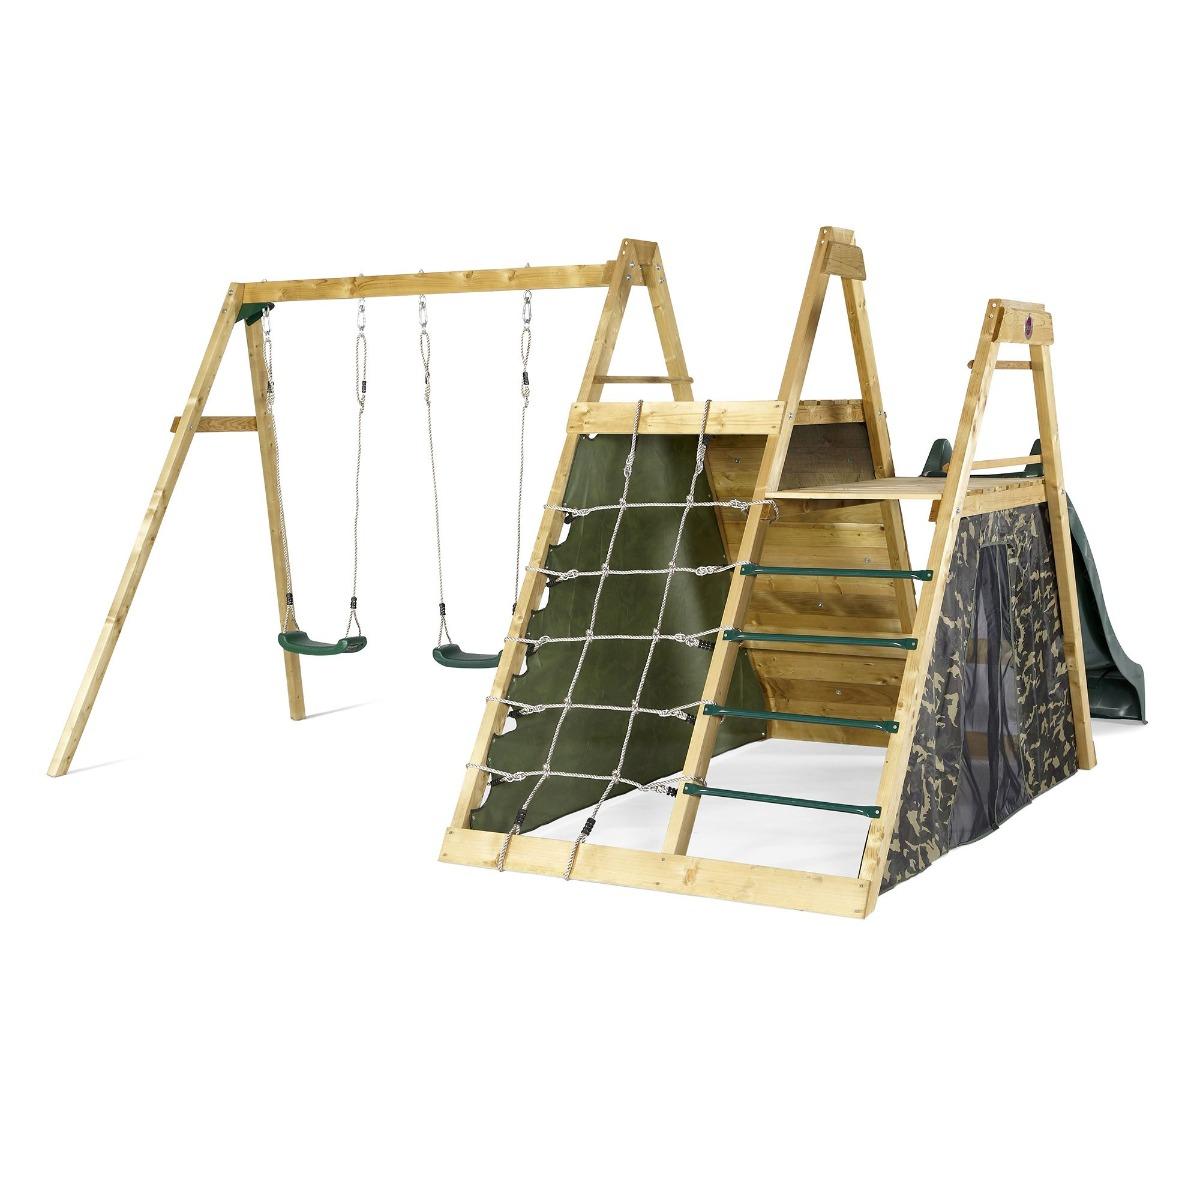 Ansamblu din lemn cu piramida leagane perete de